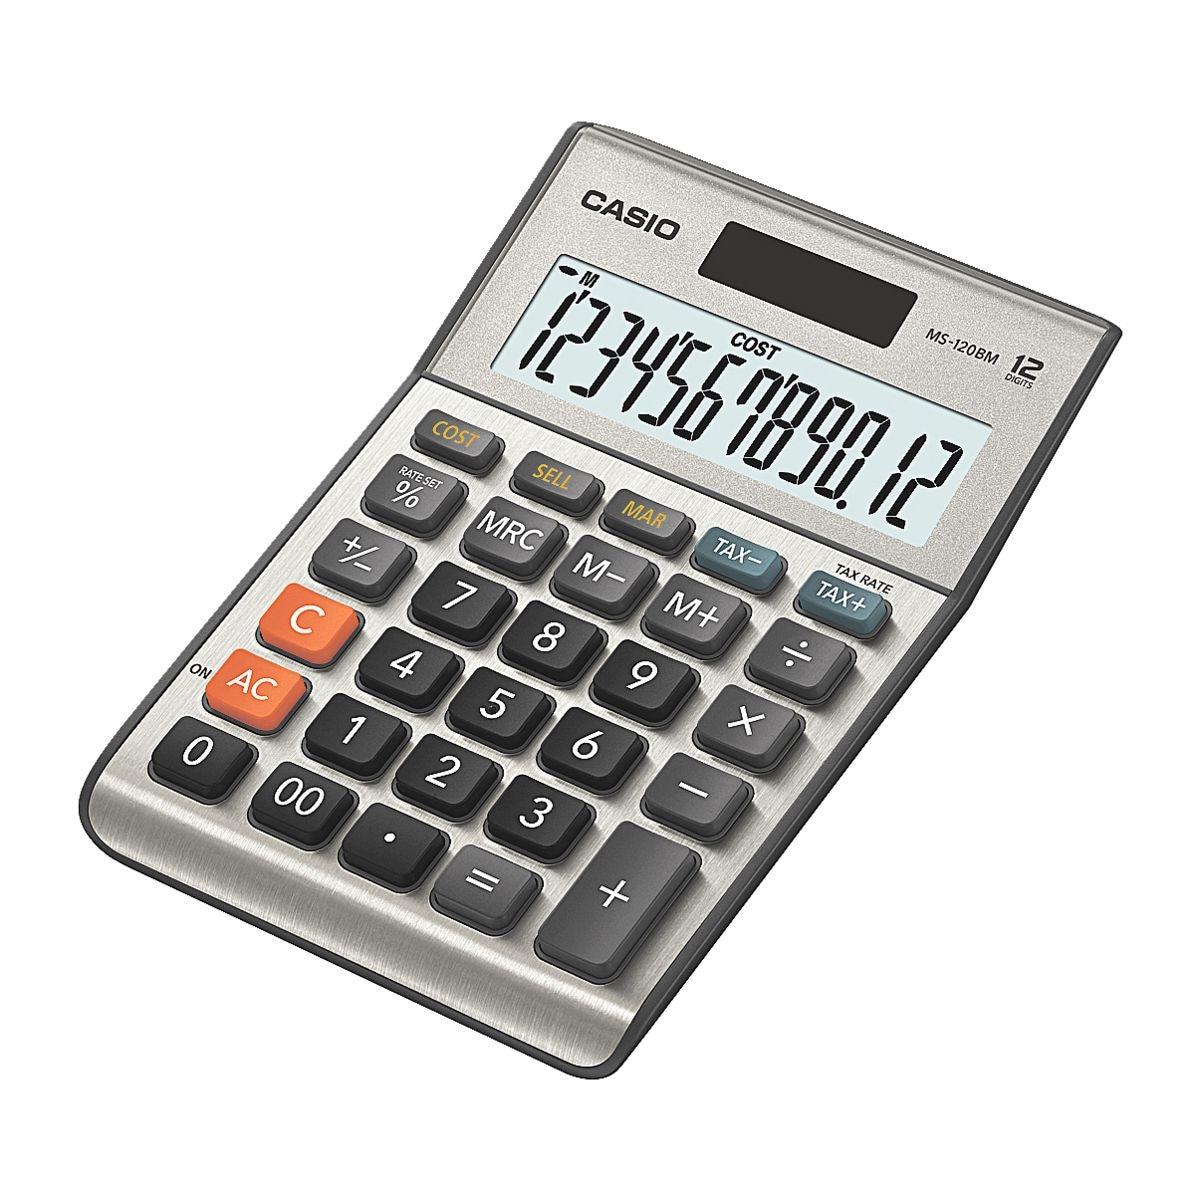 casio calculatrice ms 120bm acheter prix conomique chez otto office. Black Bedroom Furniture Sets. Home Design Ideas